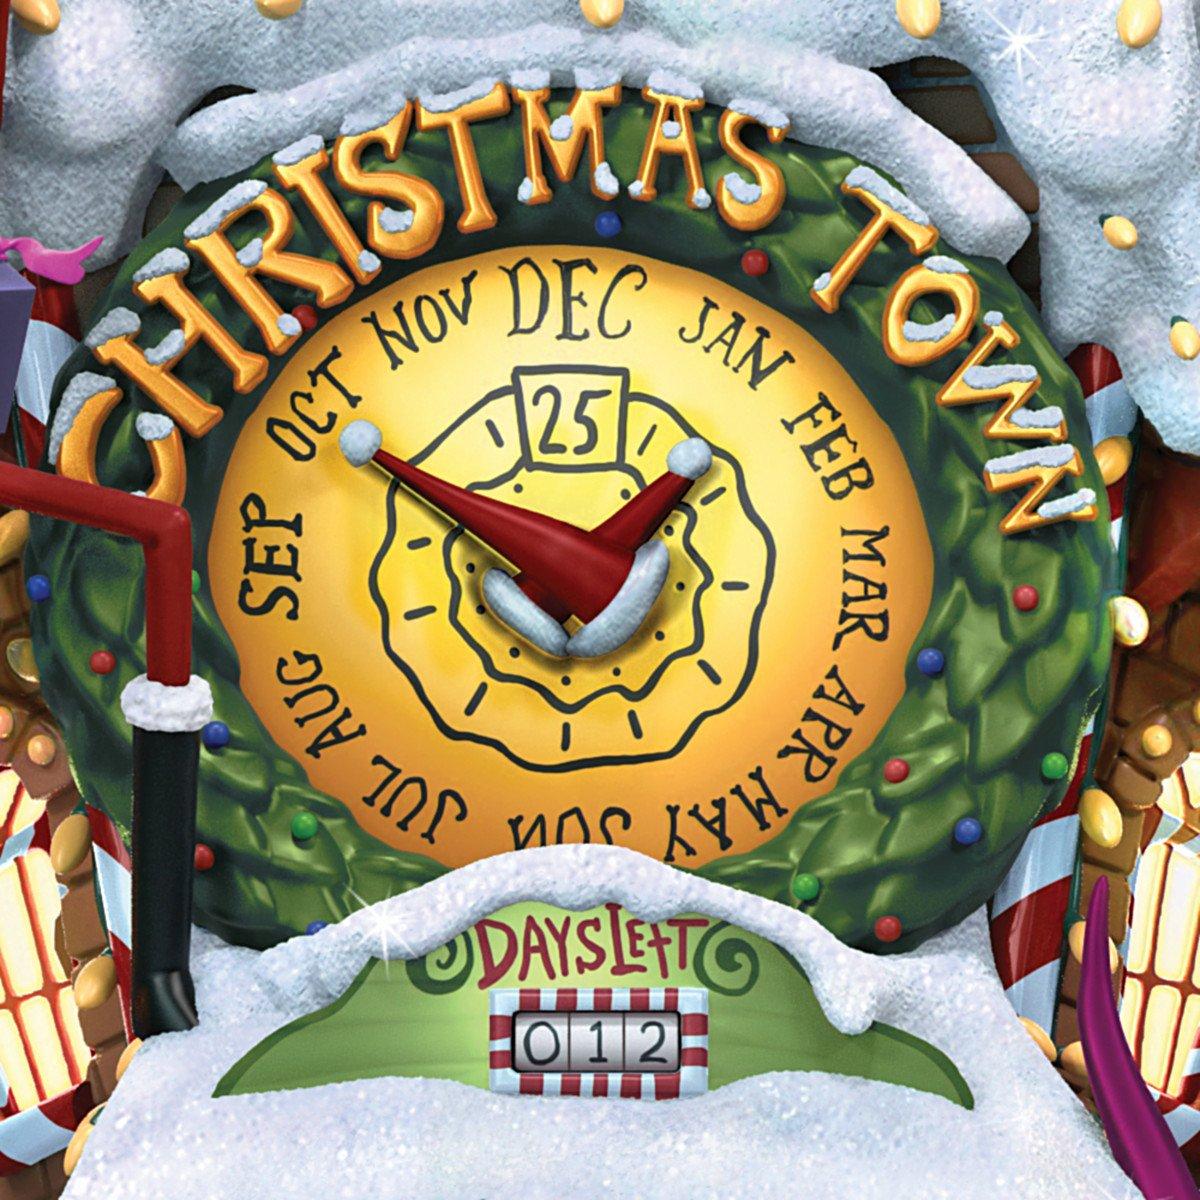 Tim Burtons The Nightmare Before Christmas Town Cuckoo Clock: Lights ...